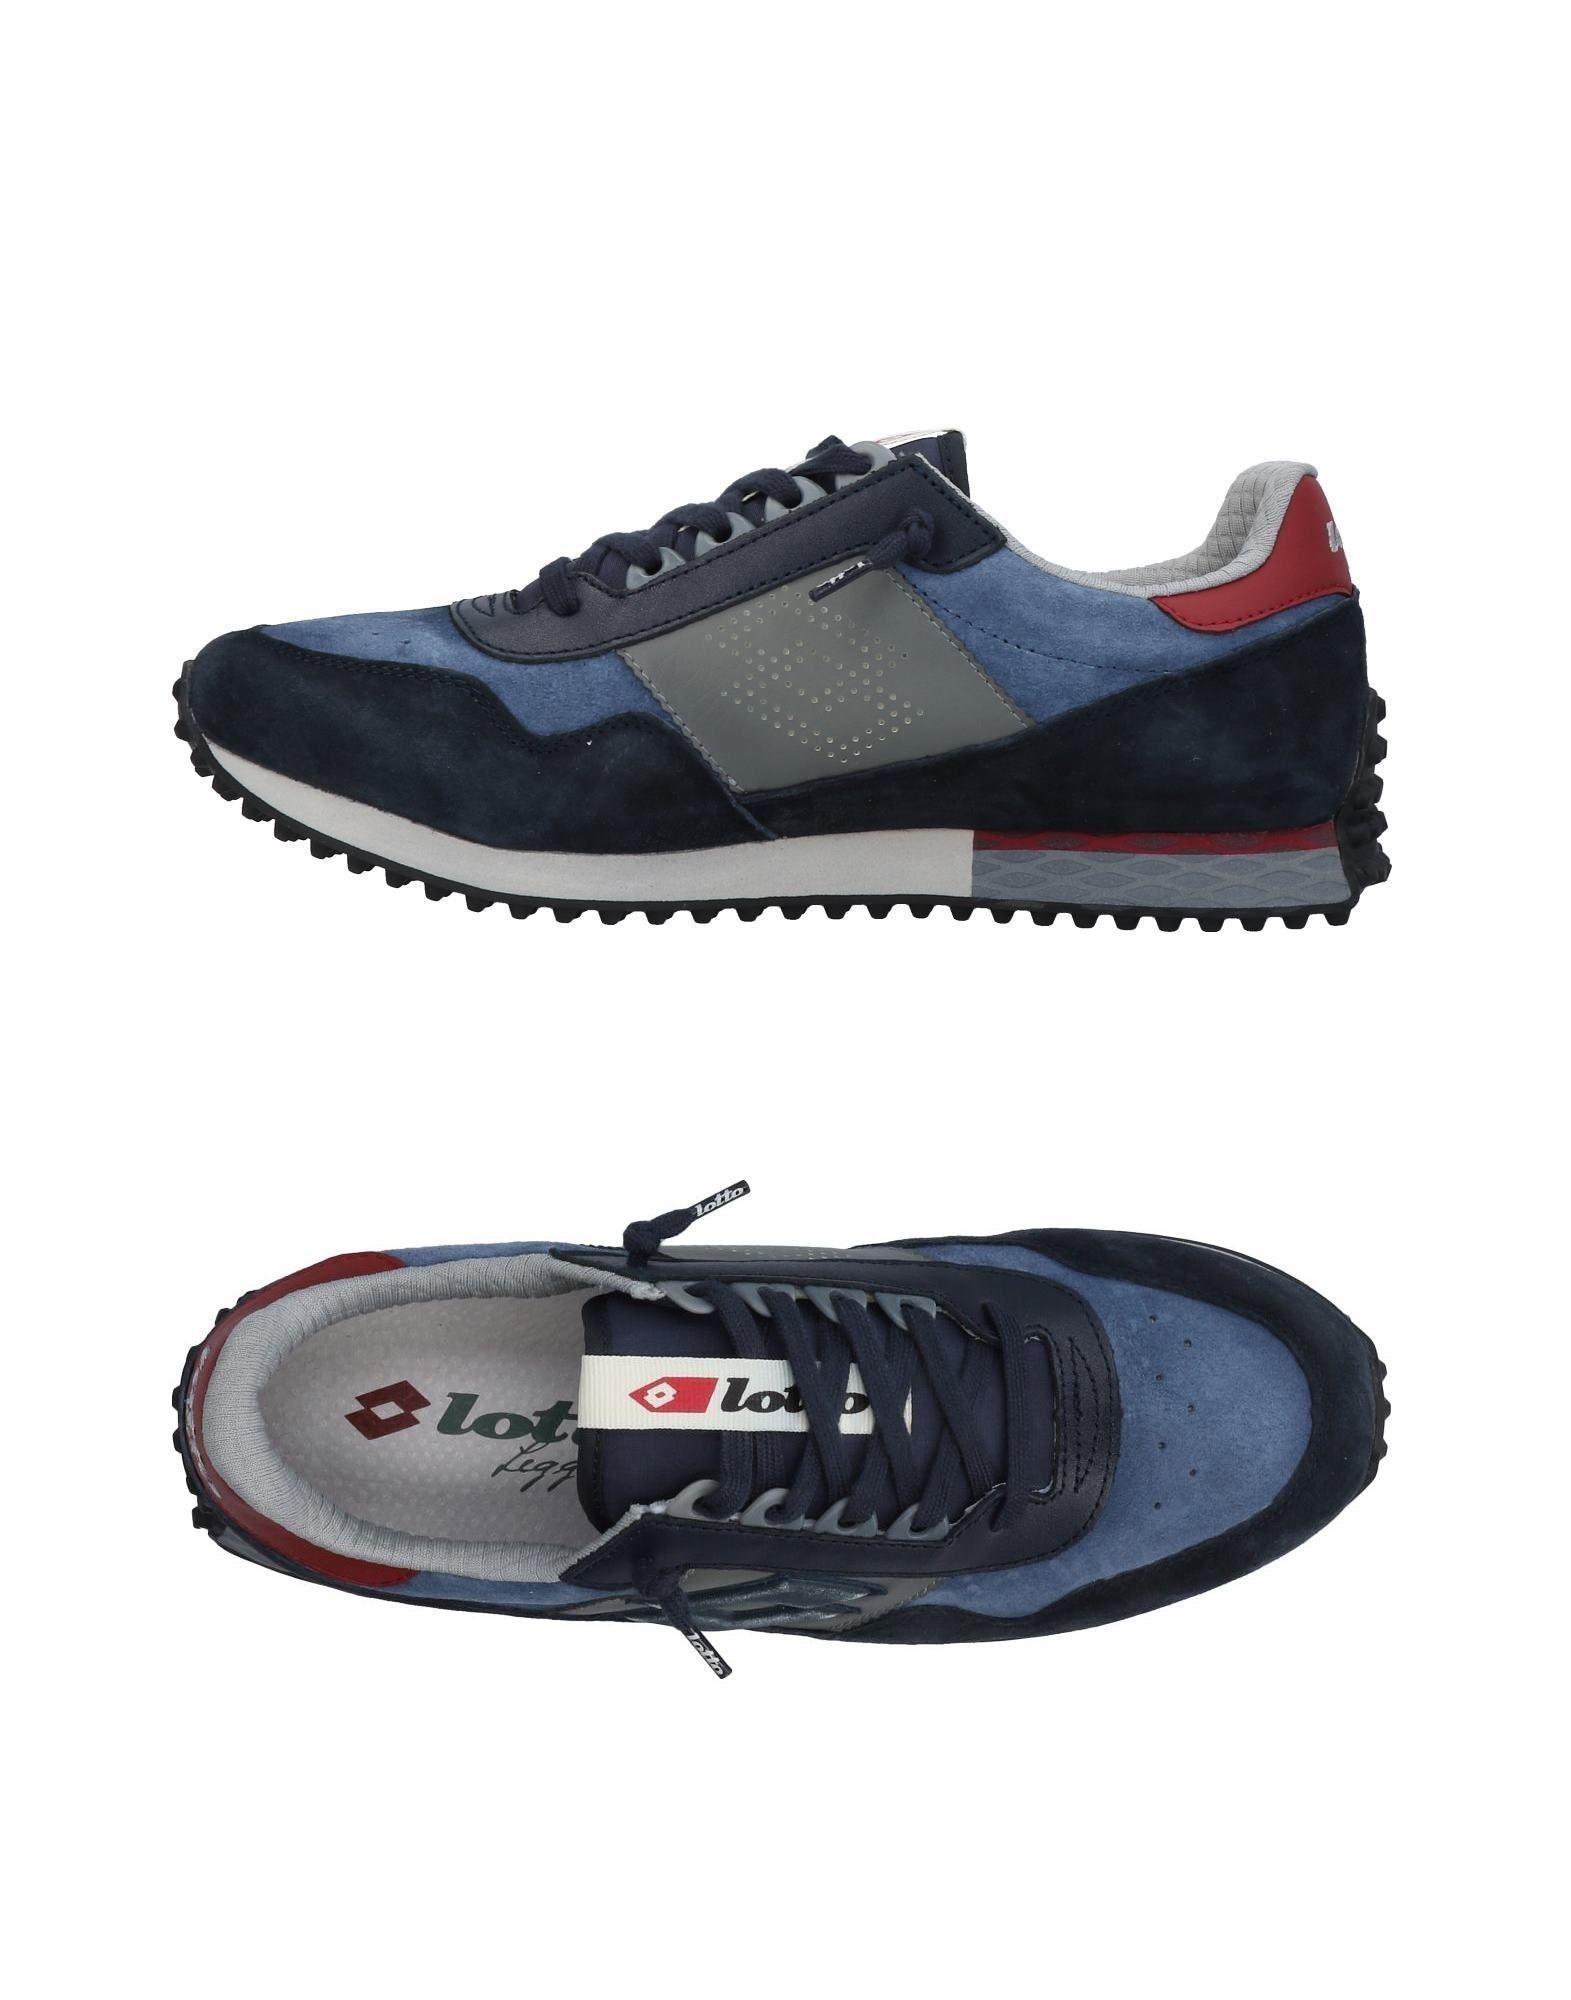 Lotto Leggenda Sneakers In Slate Blue